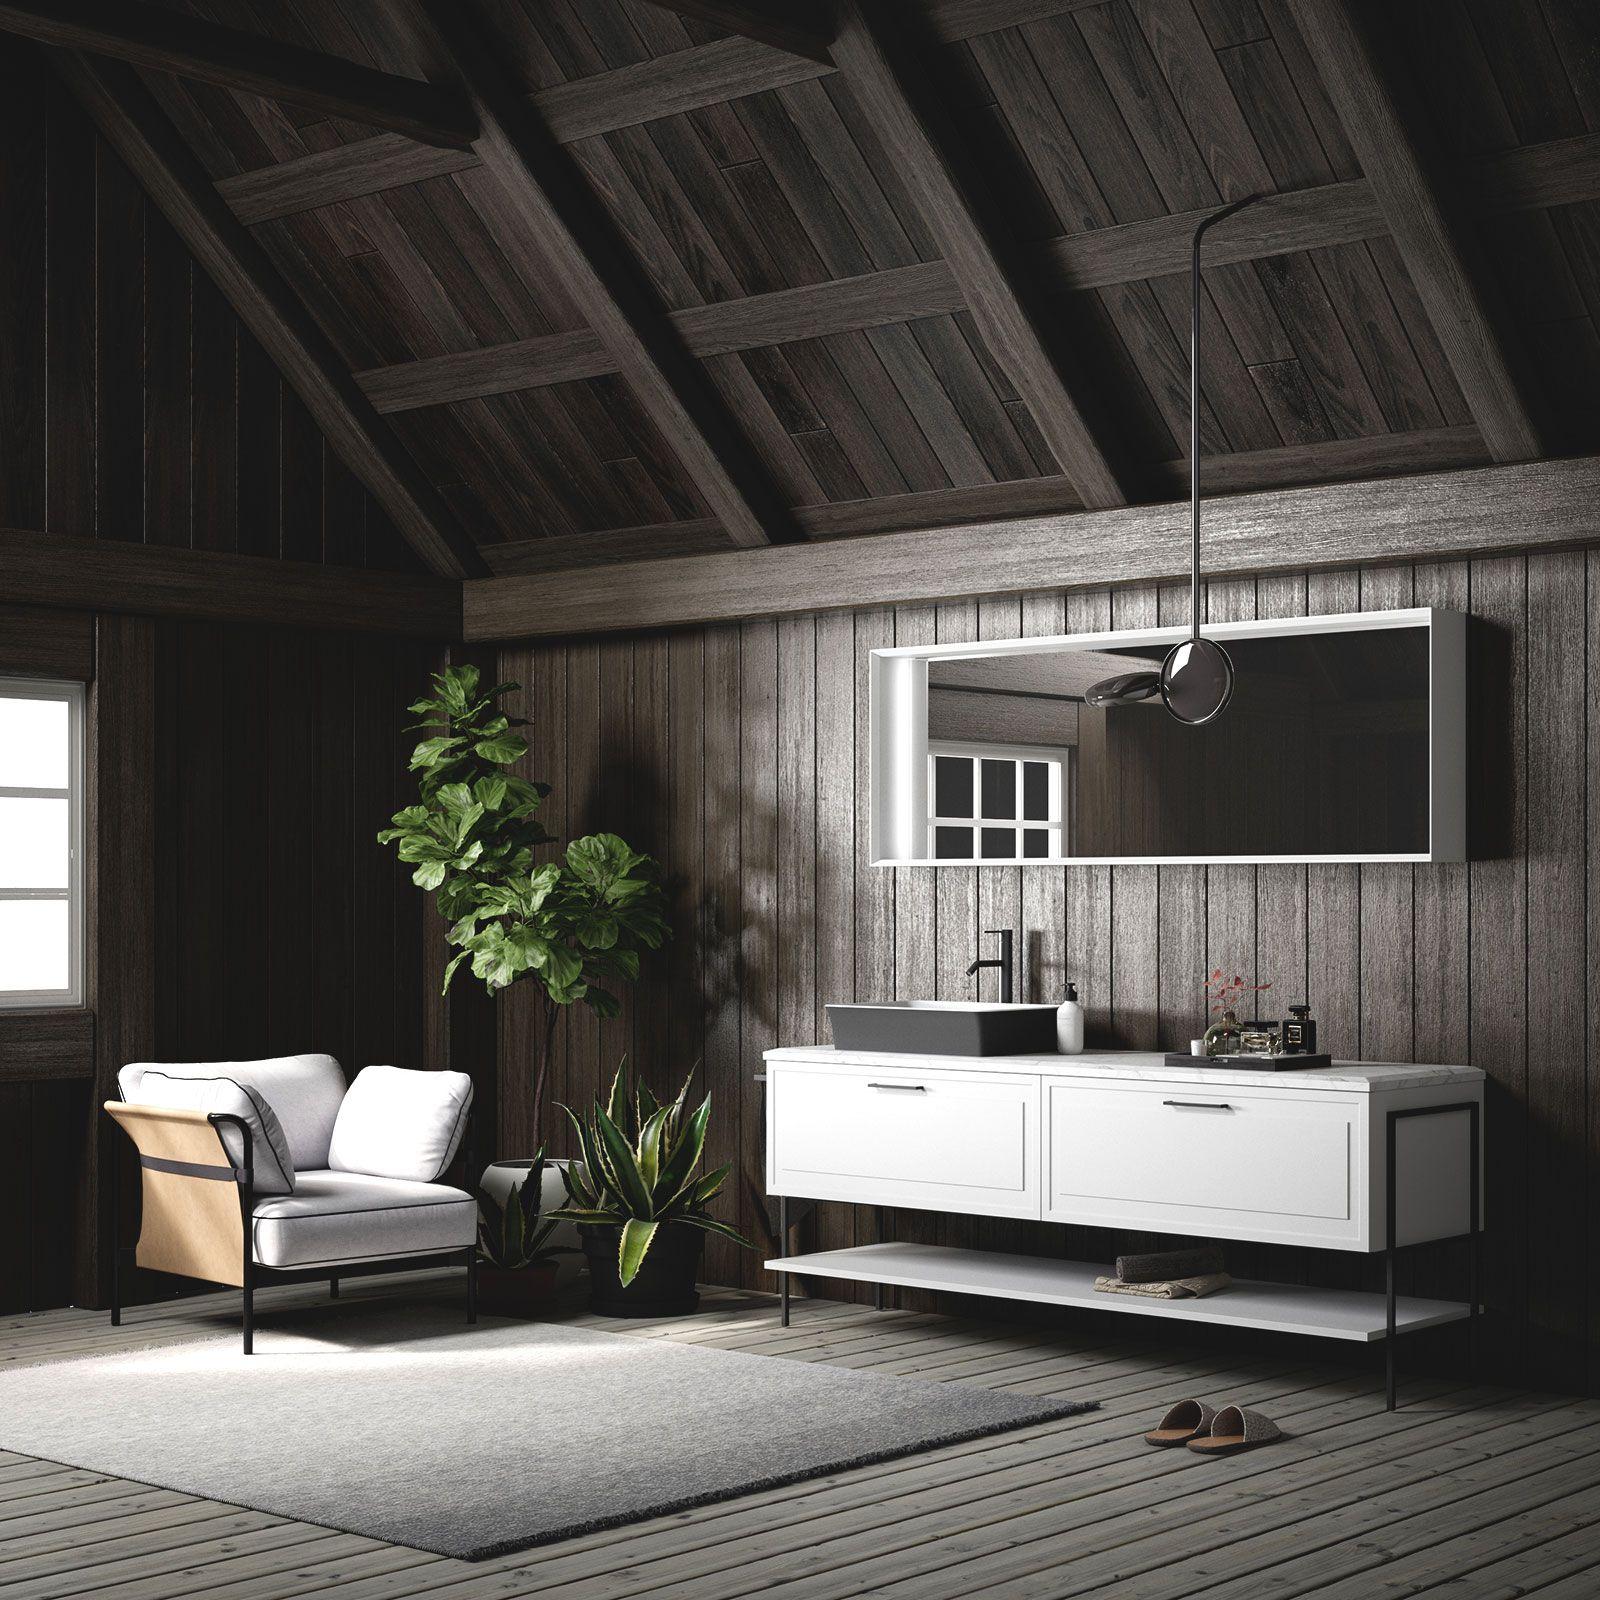 Style Bathroom Design Casa Bagno Interiors Home Arredobagno